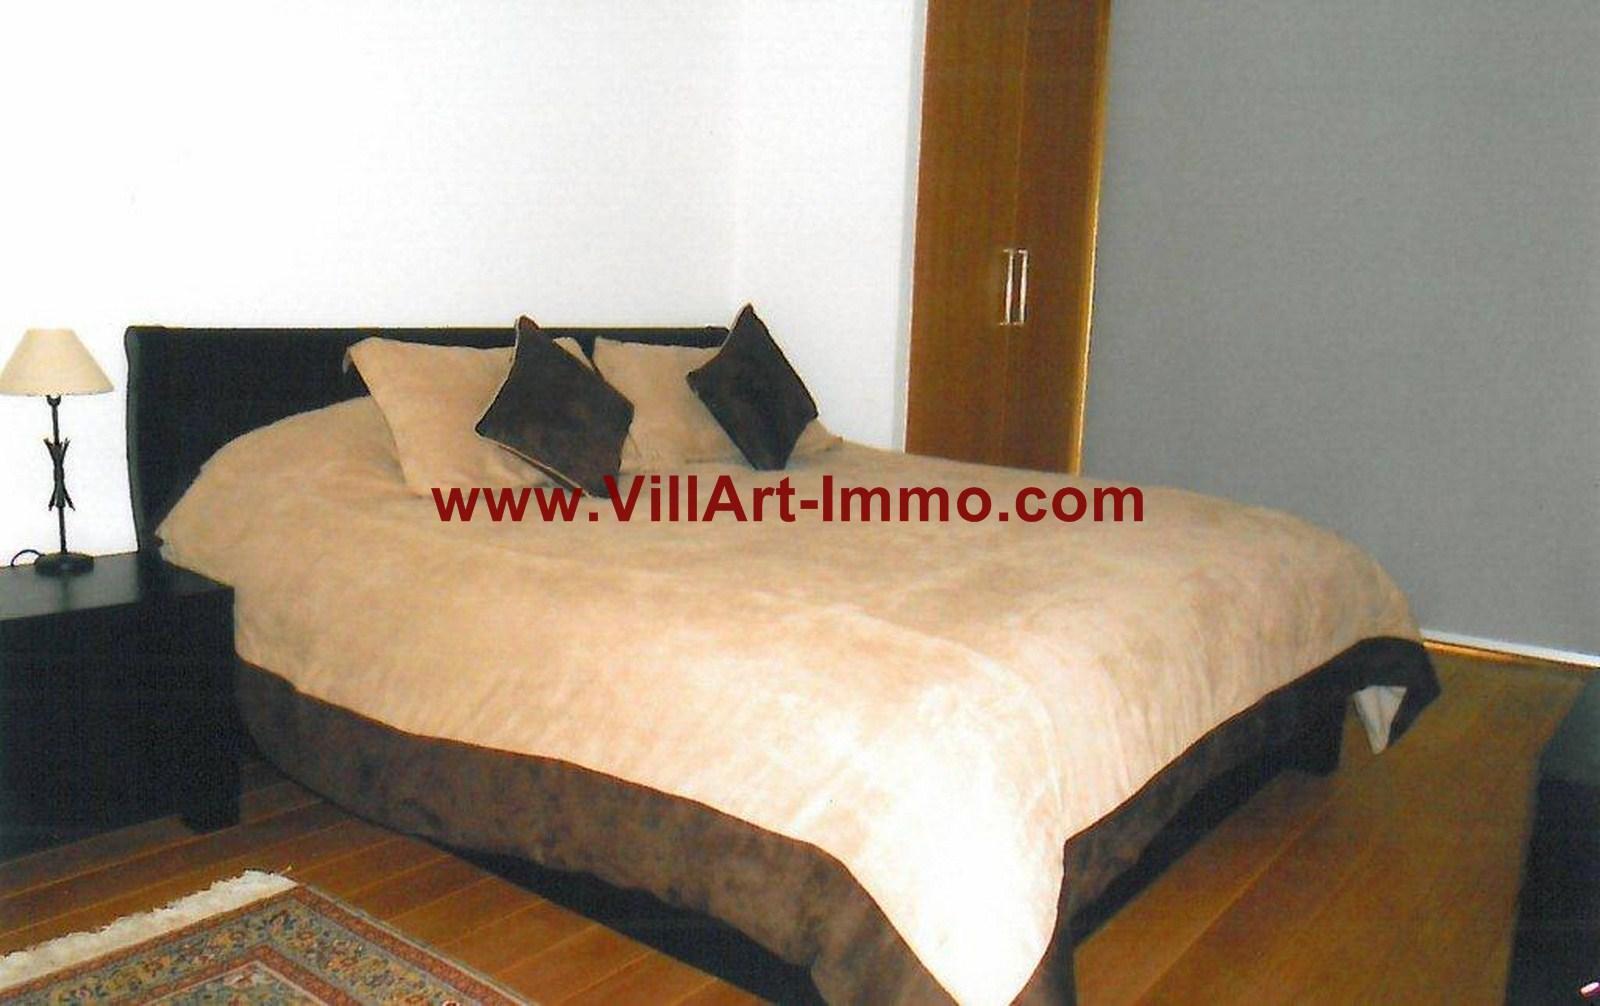 6-Location-Appartement-Meublé-Tanger-Chambre 1-L749-Villart immo